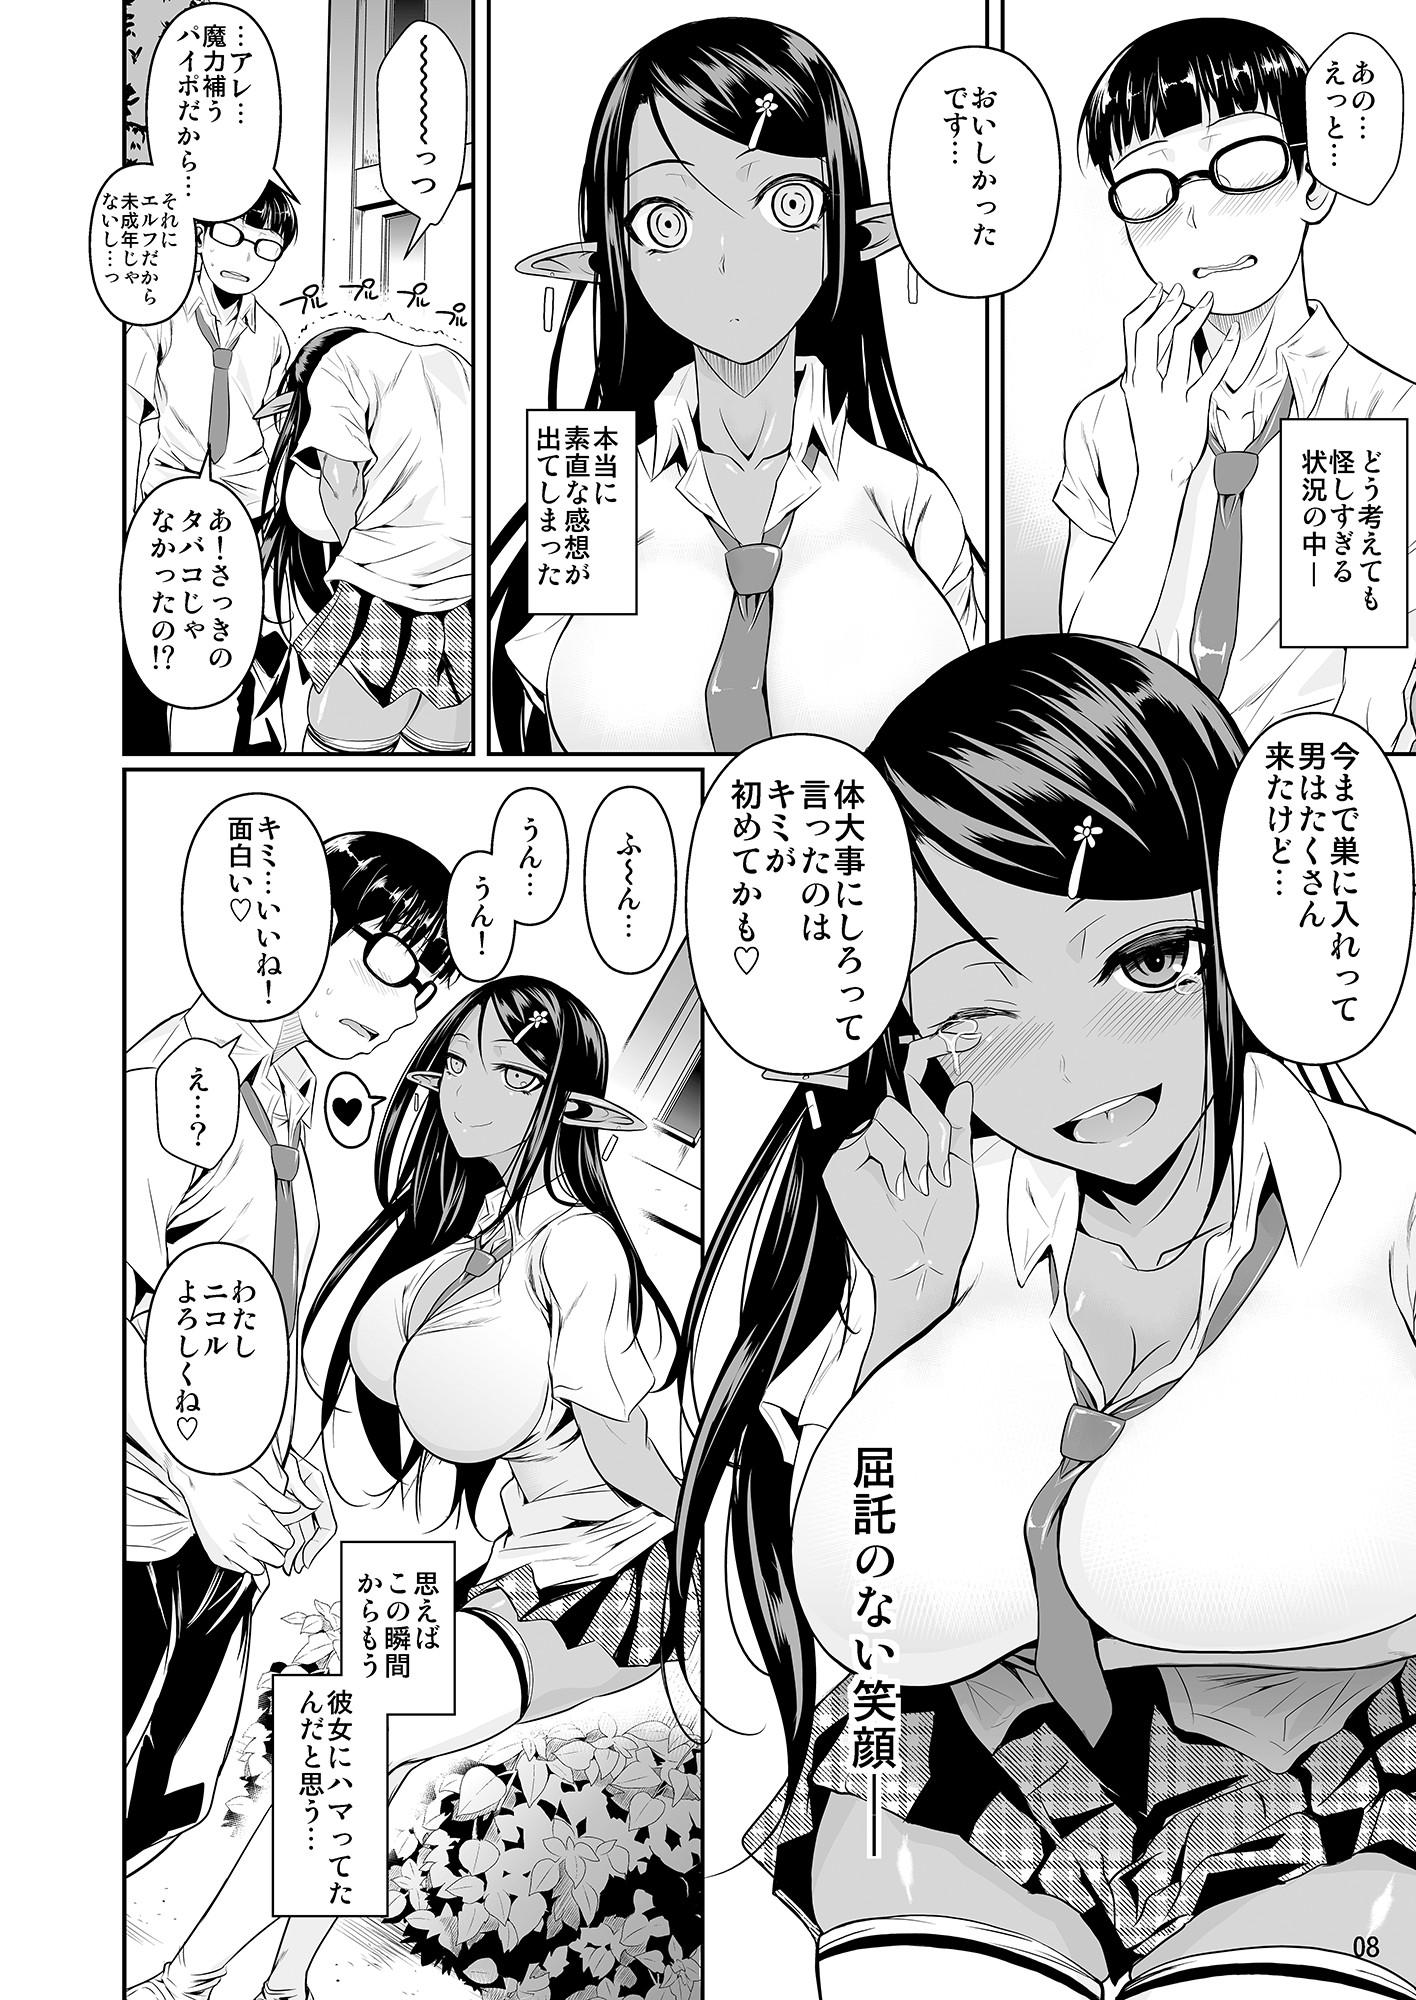 FANZA 同人【ハイエルフ×ハイ○クール黒】